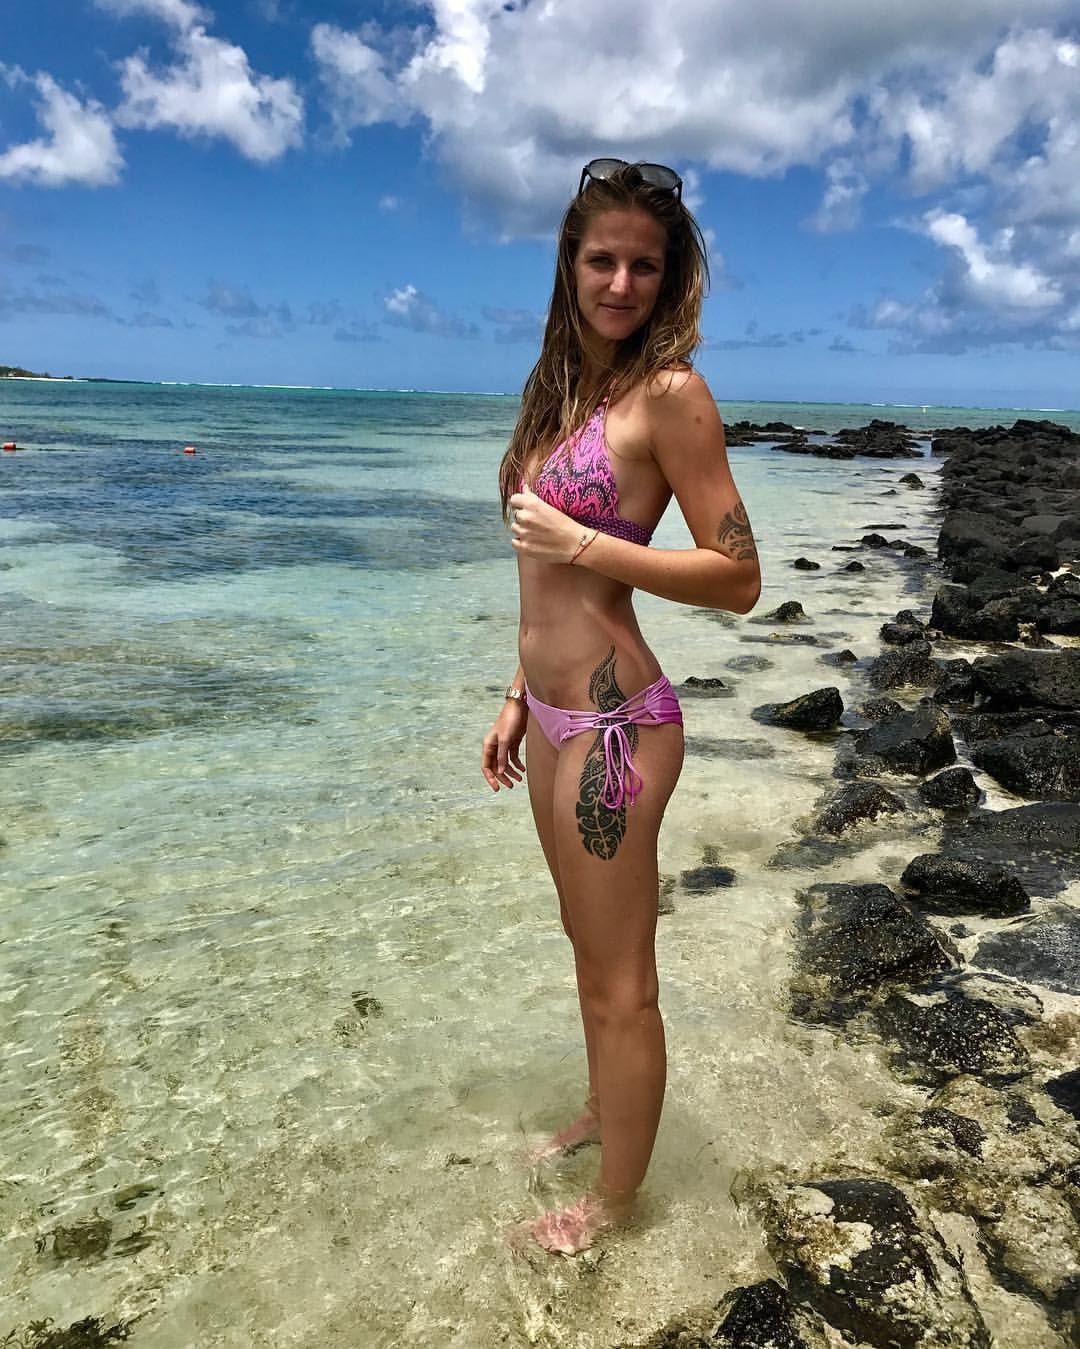 8e44d22ab02b3 Karolina Pliskova Simona Halep Bikini, Female Athletes, Bikini Swimwear,  Swimsuits, Bikinis,